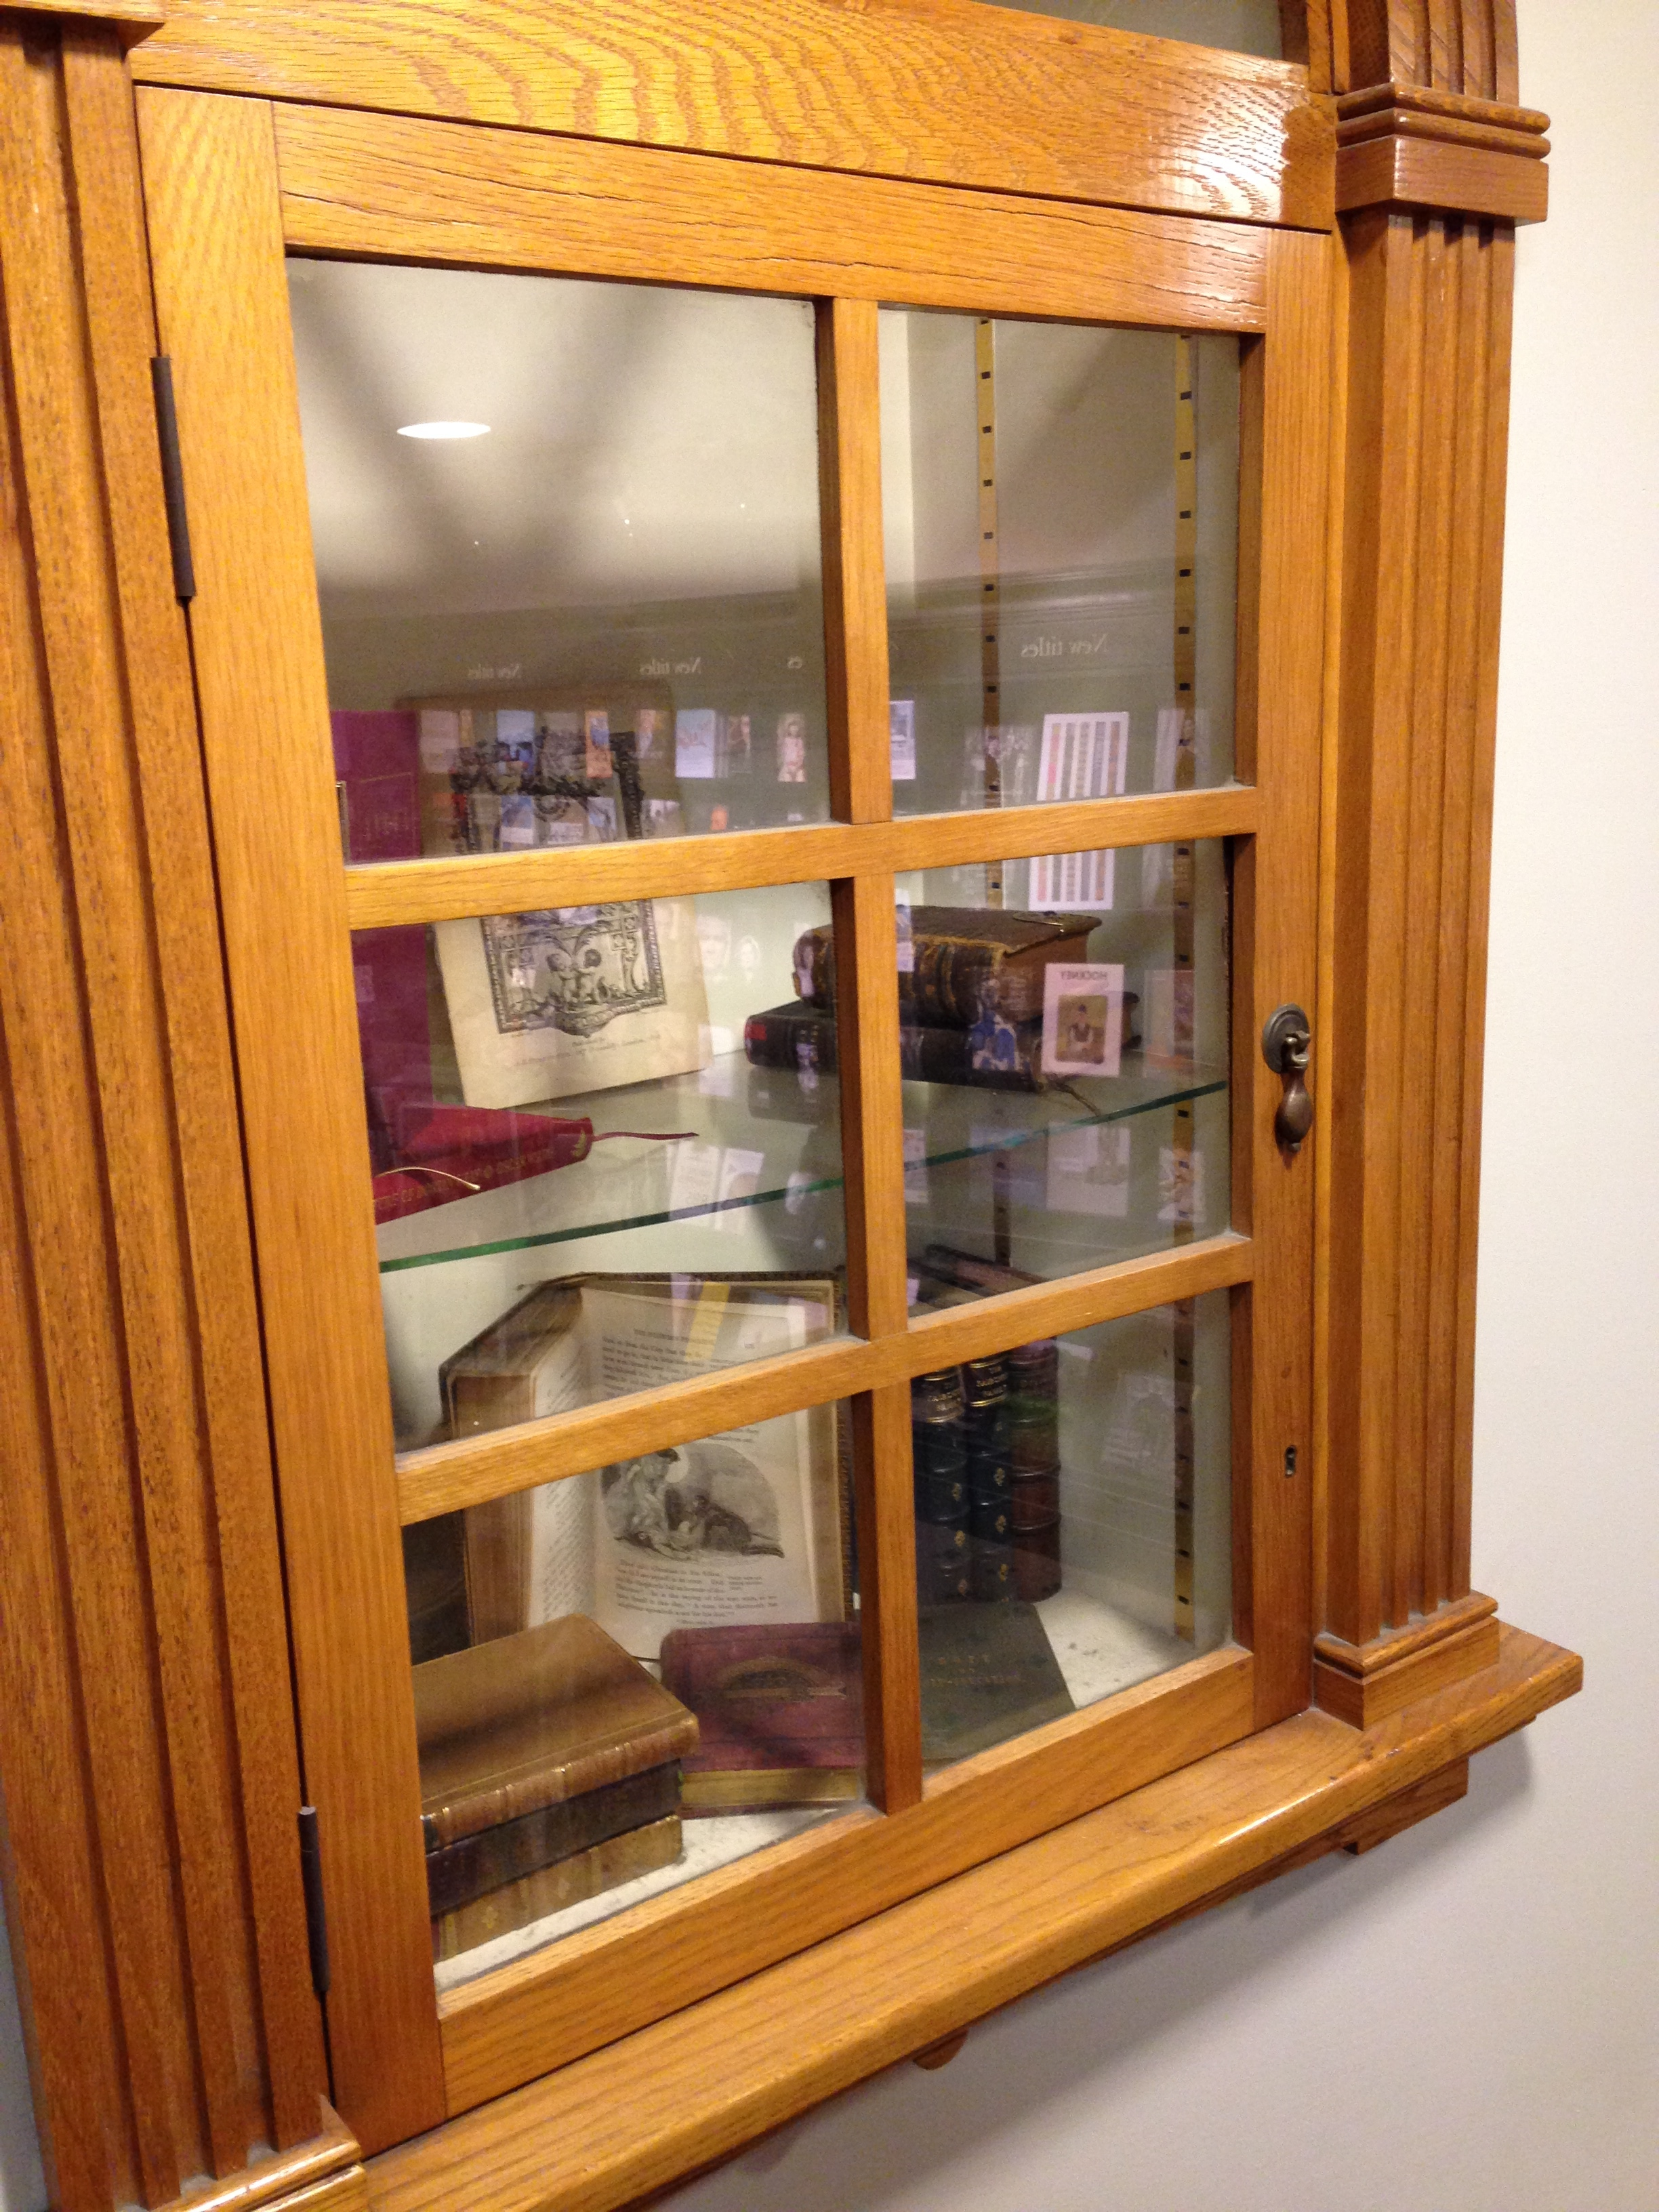 Hatchard's Bookshop | Regency London | Philippa Jane Keyworth